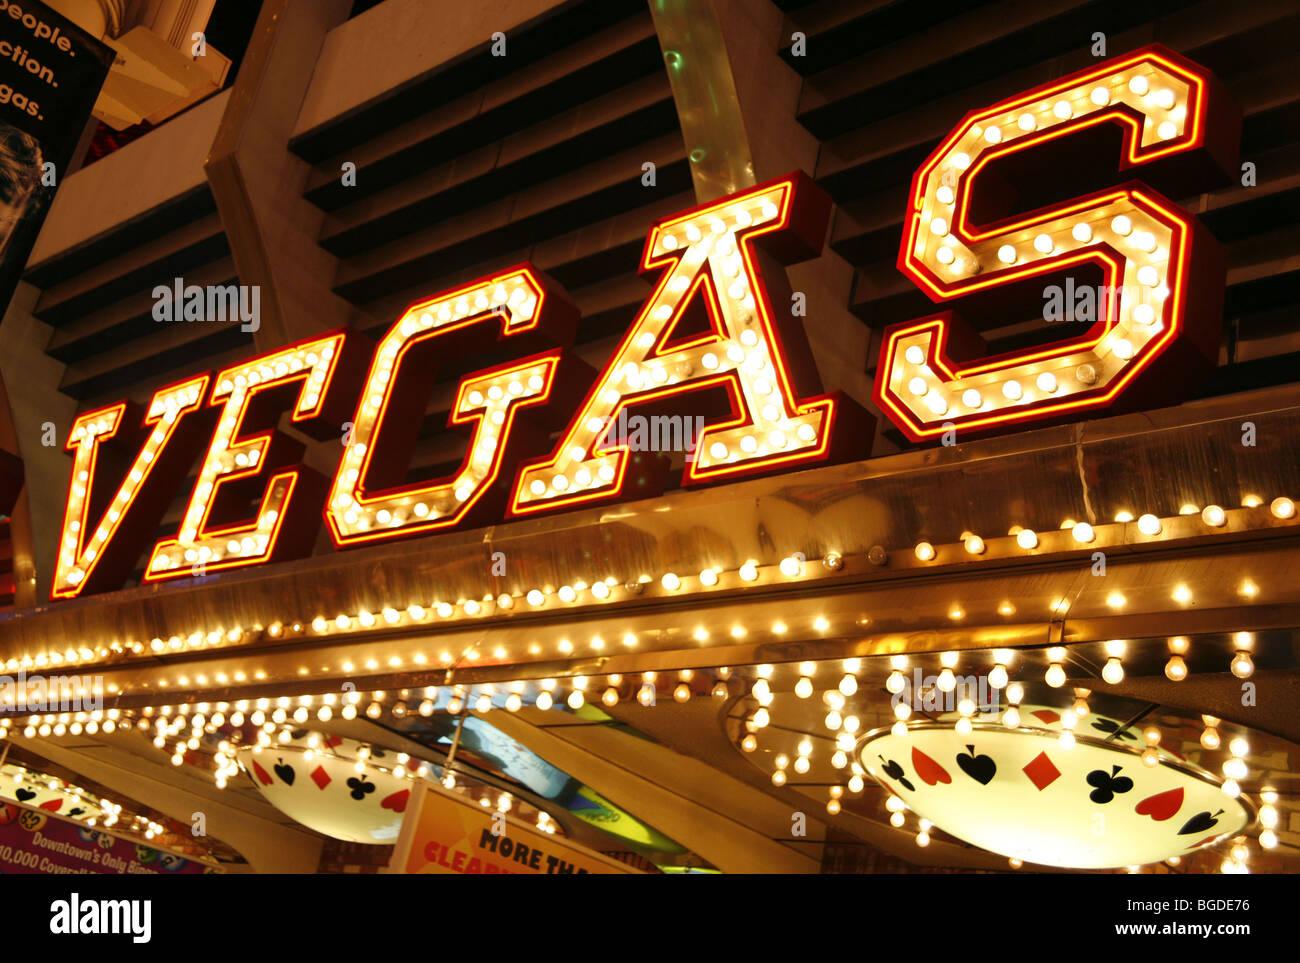 kewagin casino